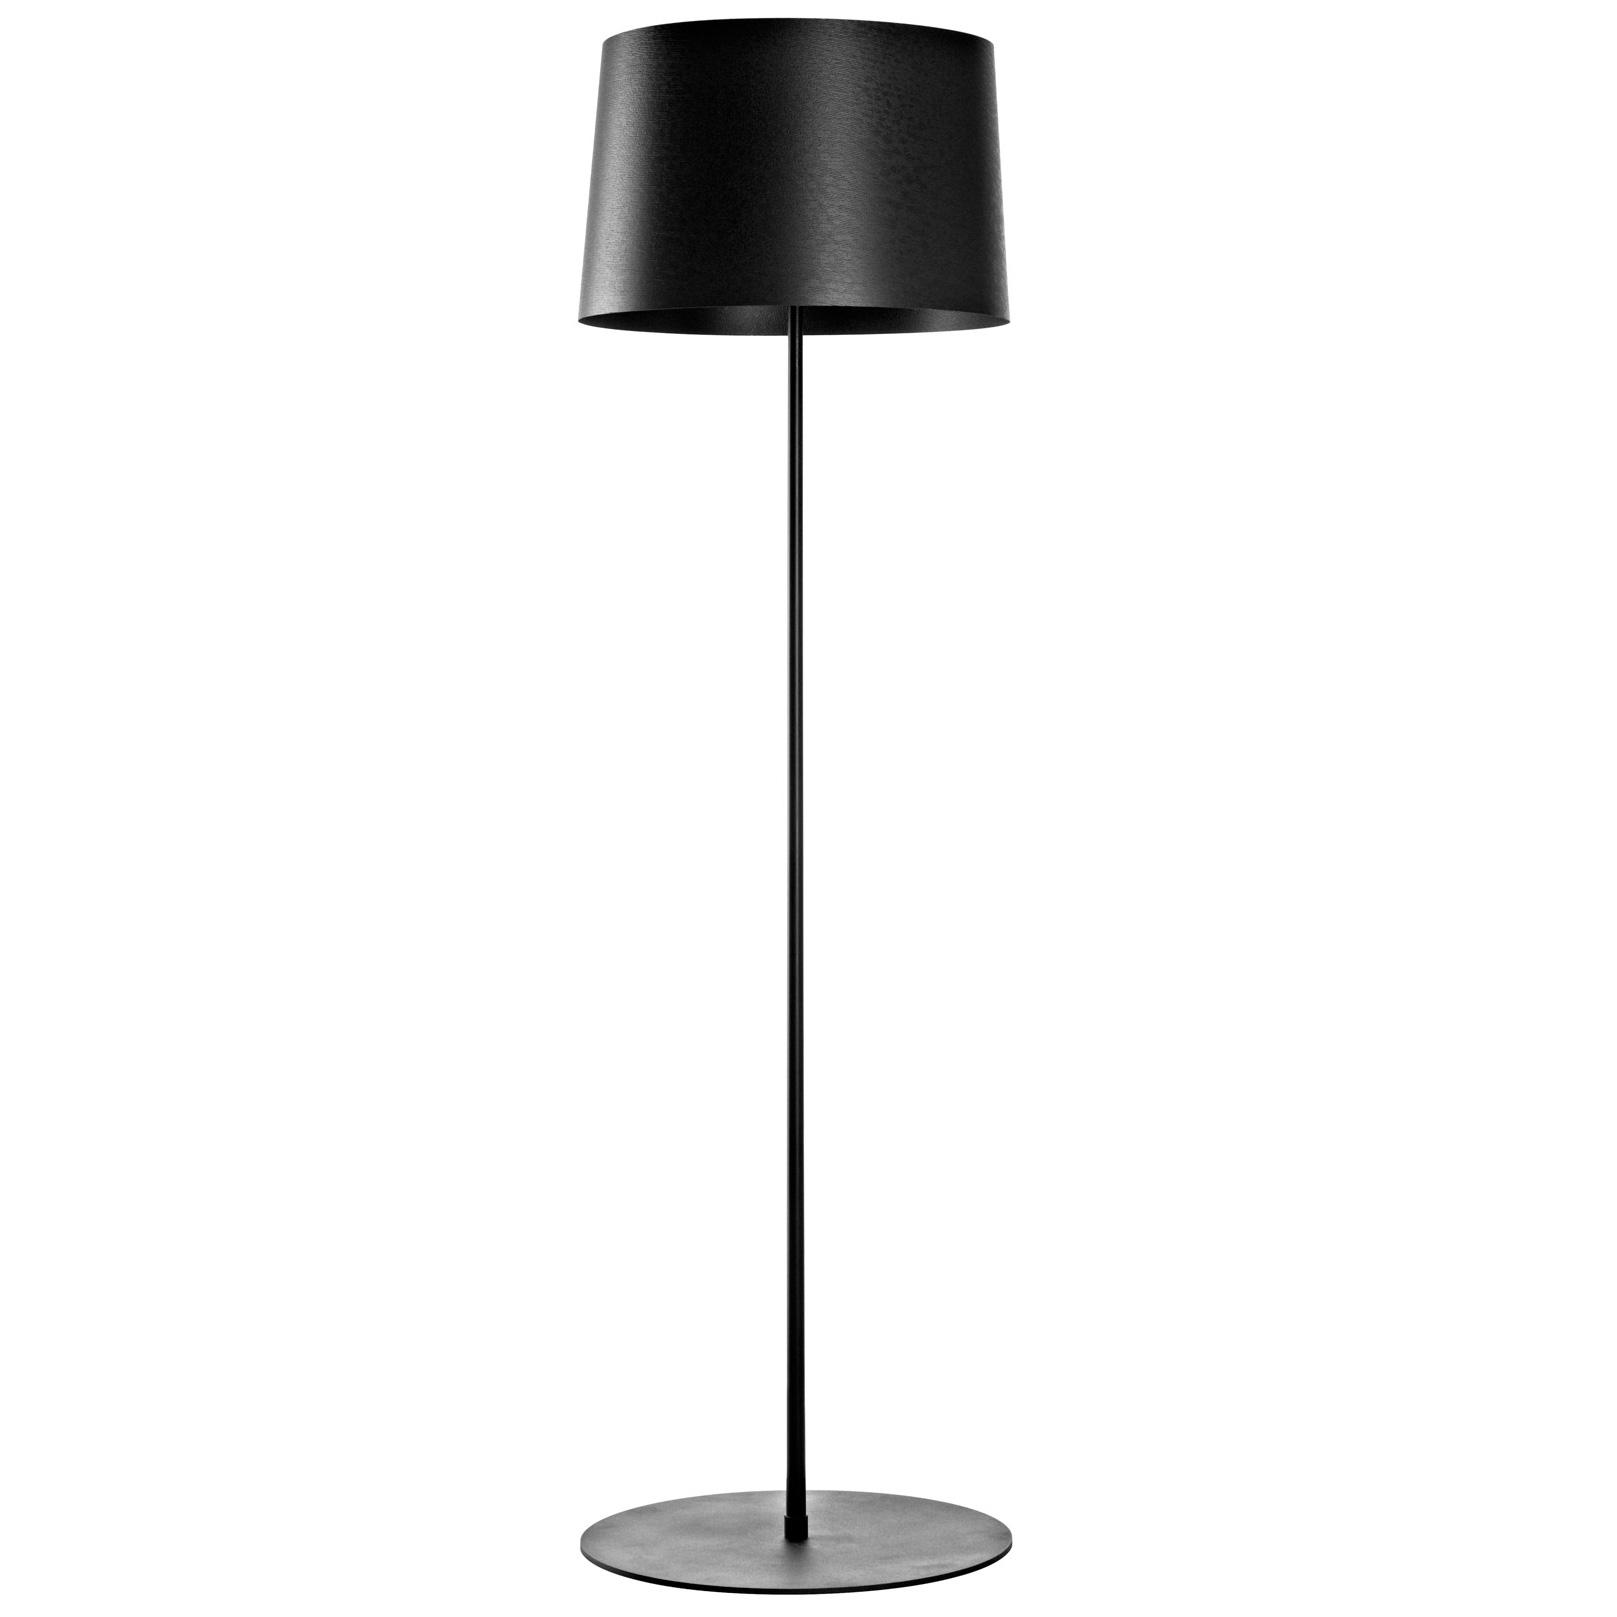 Lettura floor lamp by foscarini 159004 20 u twiggy lettura floor lamp by foscarini 159004 20 u geotapseo Image collections